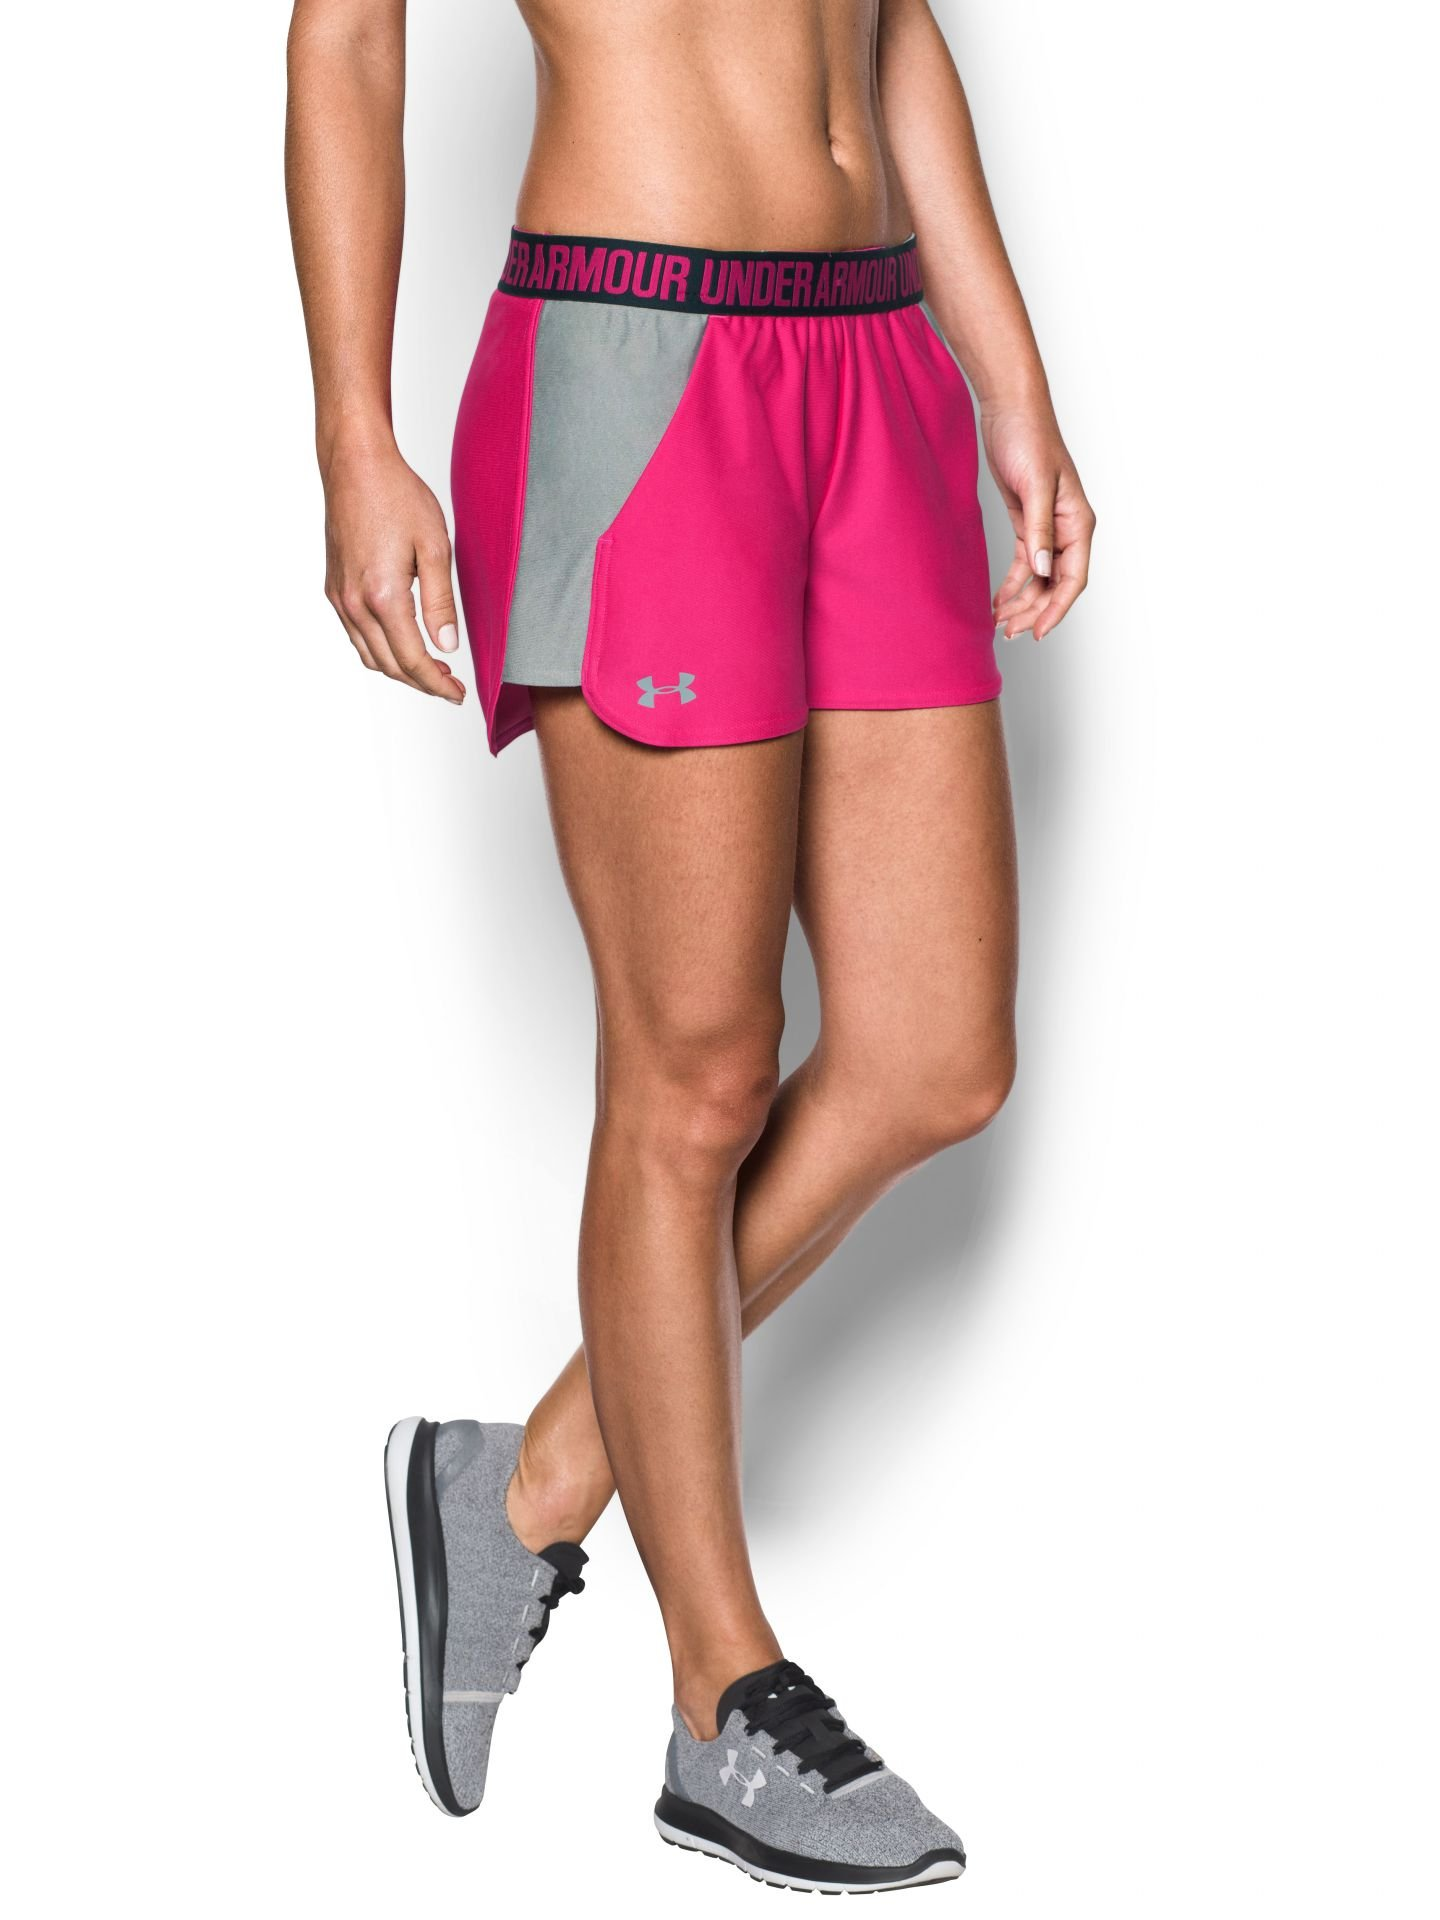 Under Armour Women's UA Play Up 2.0 Shorts, Tropic Pink/True Gray Heather, XXSmall